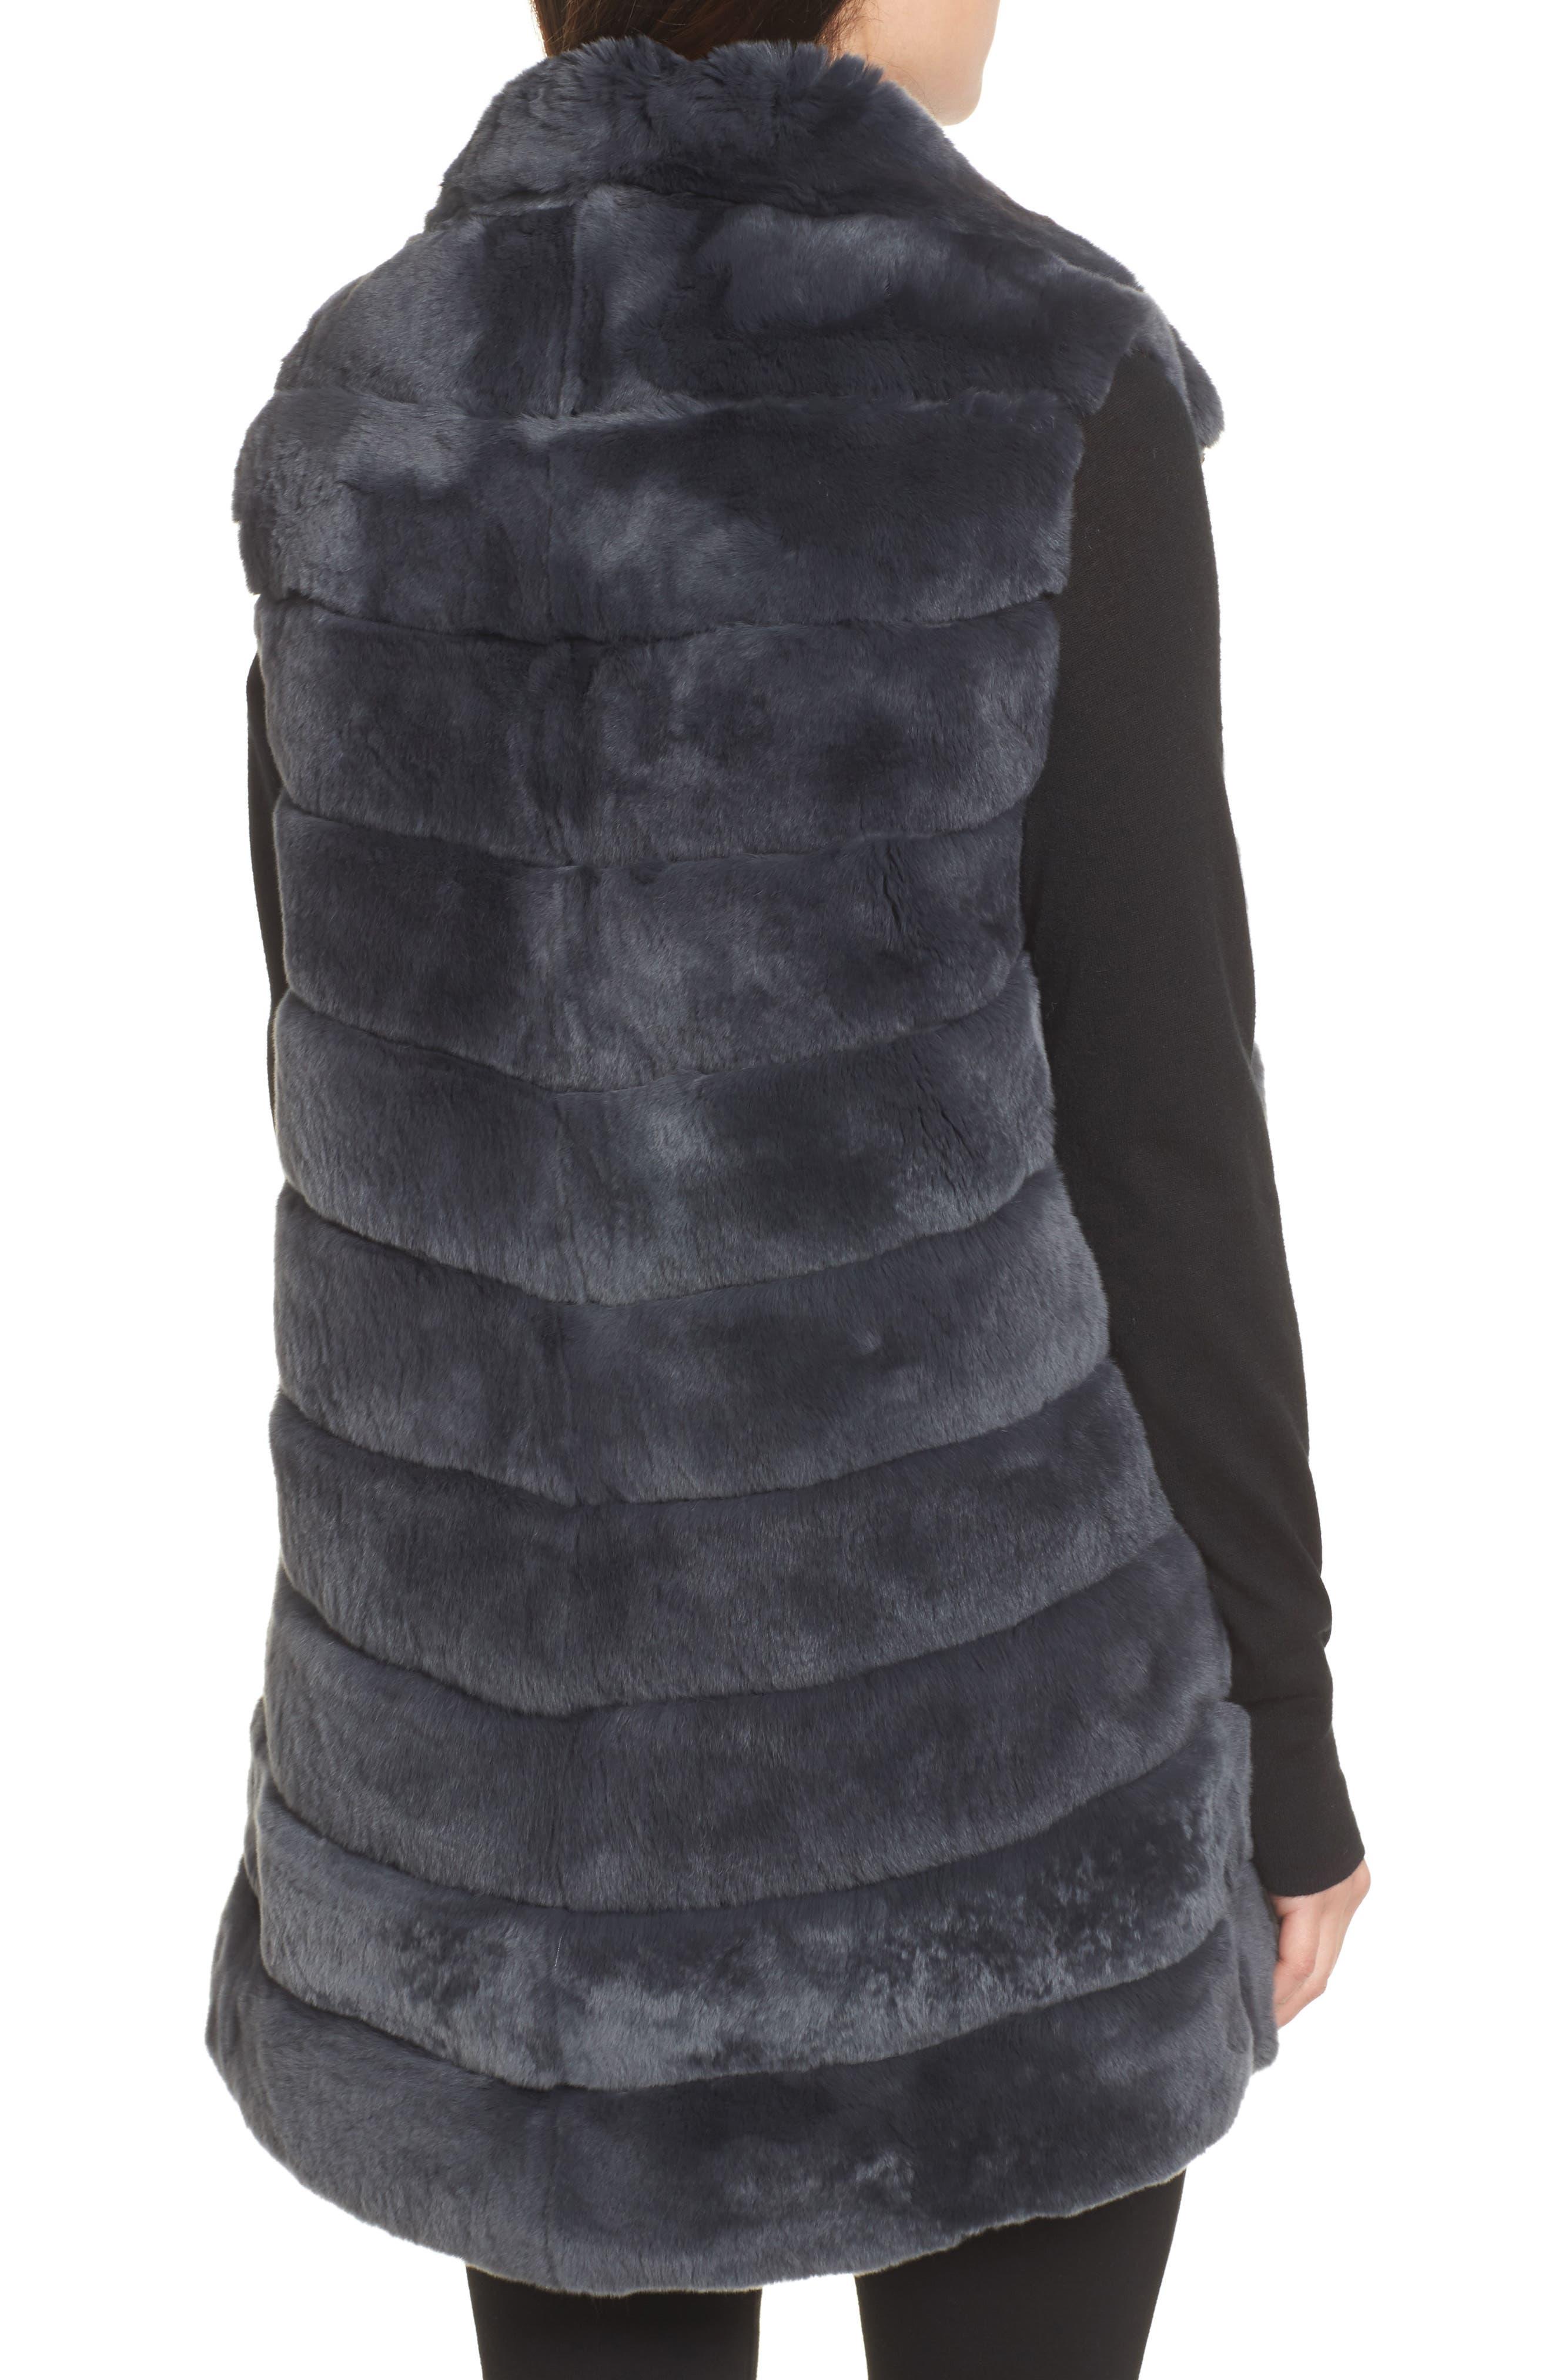 Reversible Genuine Rabbit Fur Vest,                             Alternate thumbnail 2, color,                             410